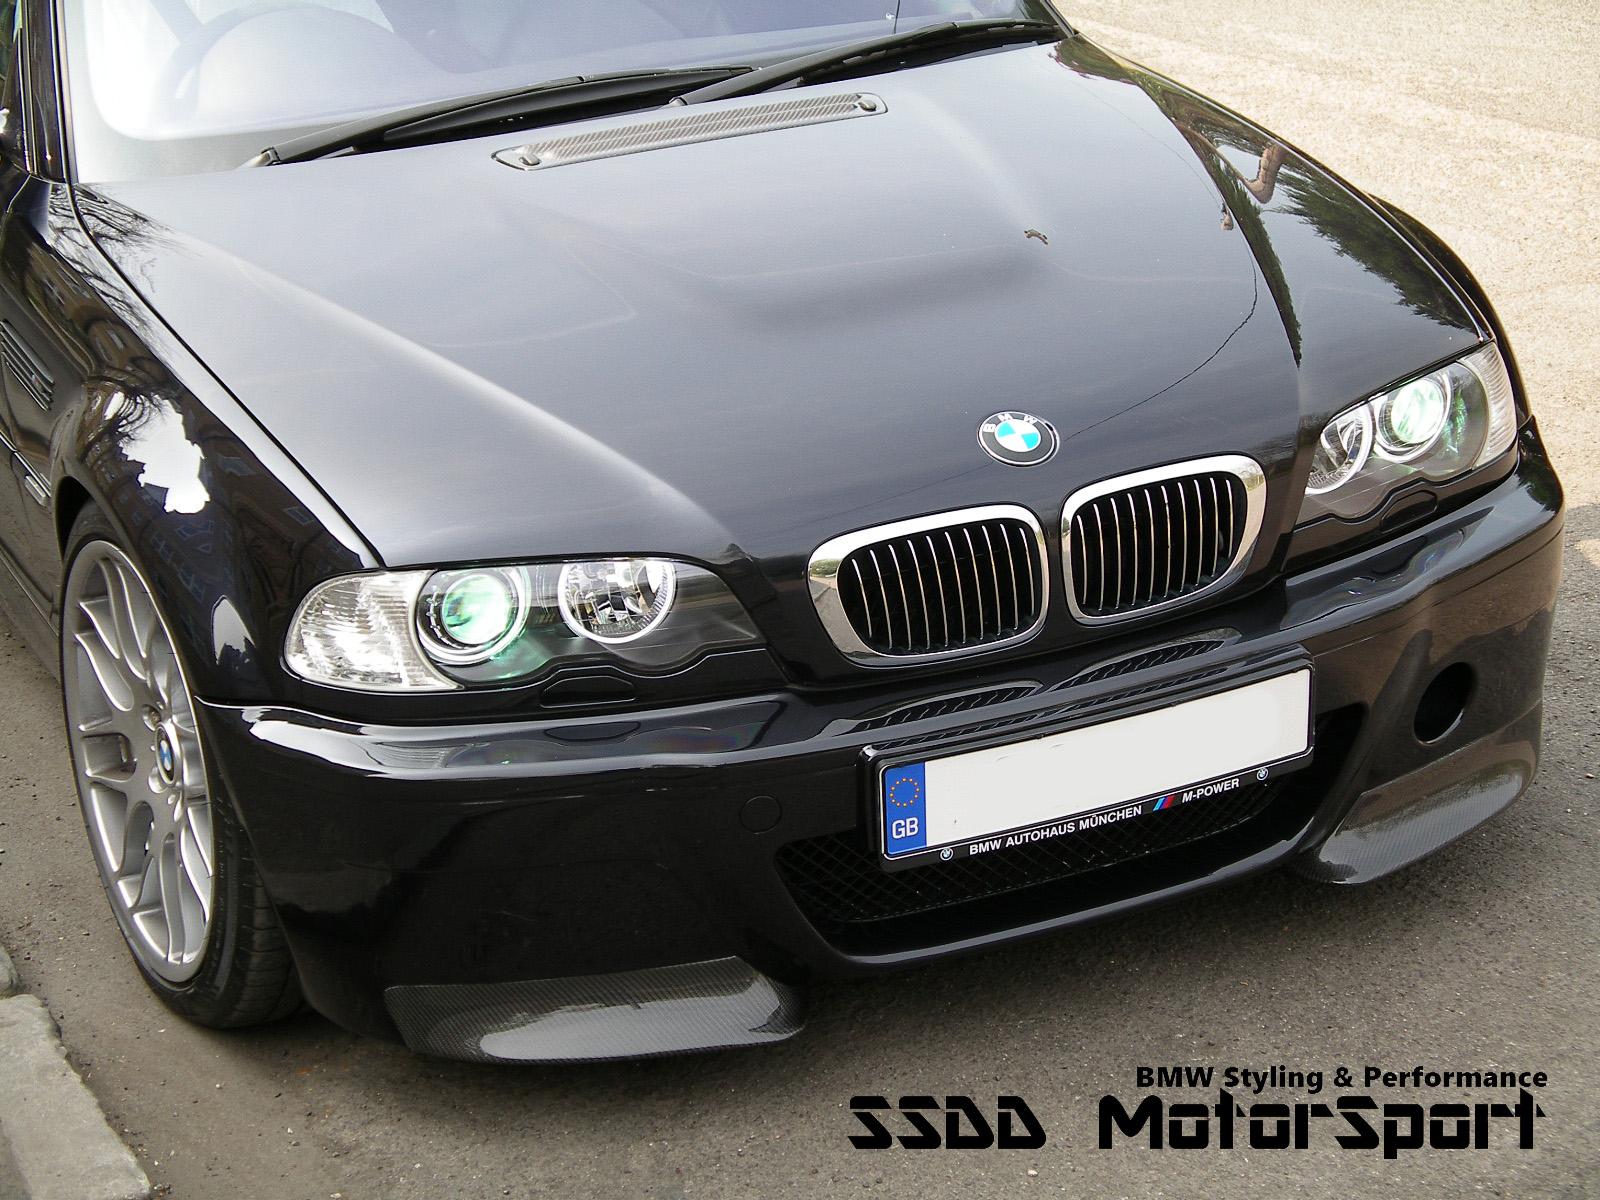 bmw-e46-m3-csl-bumper-ssdd-motorsport-5.jpg